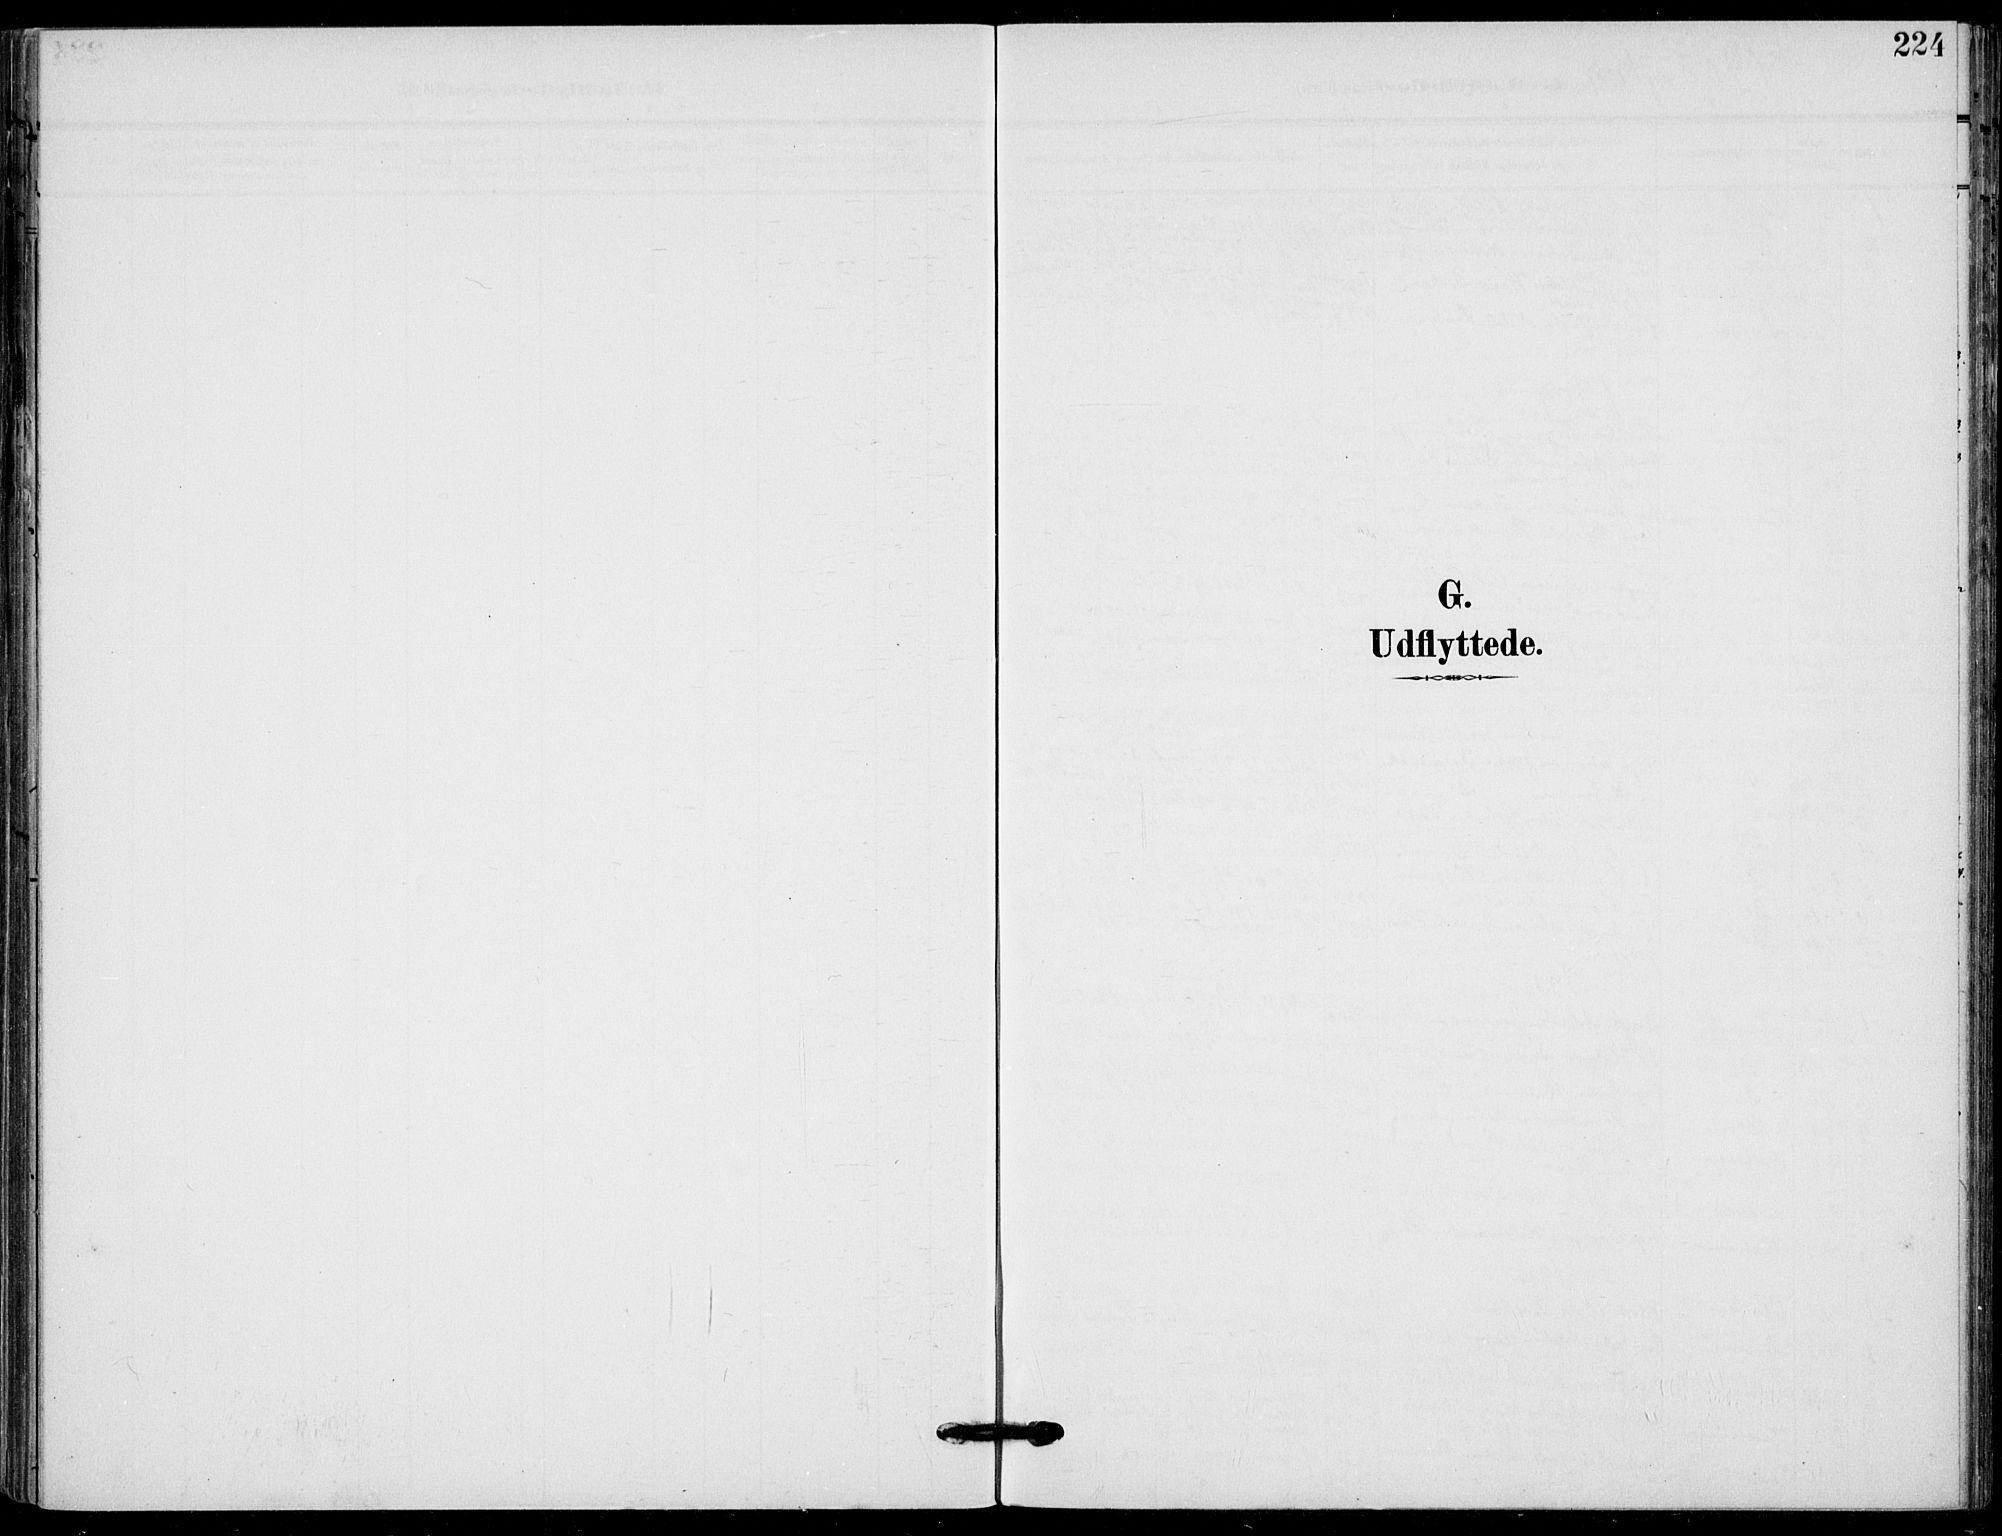 SAKO, Holla kirkebøker, F/Fa/L0012: Parish register (official) no. 12, 1907-1923, p. 224